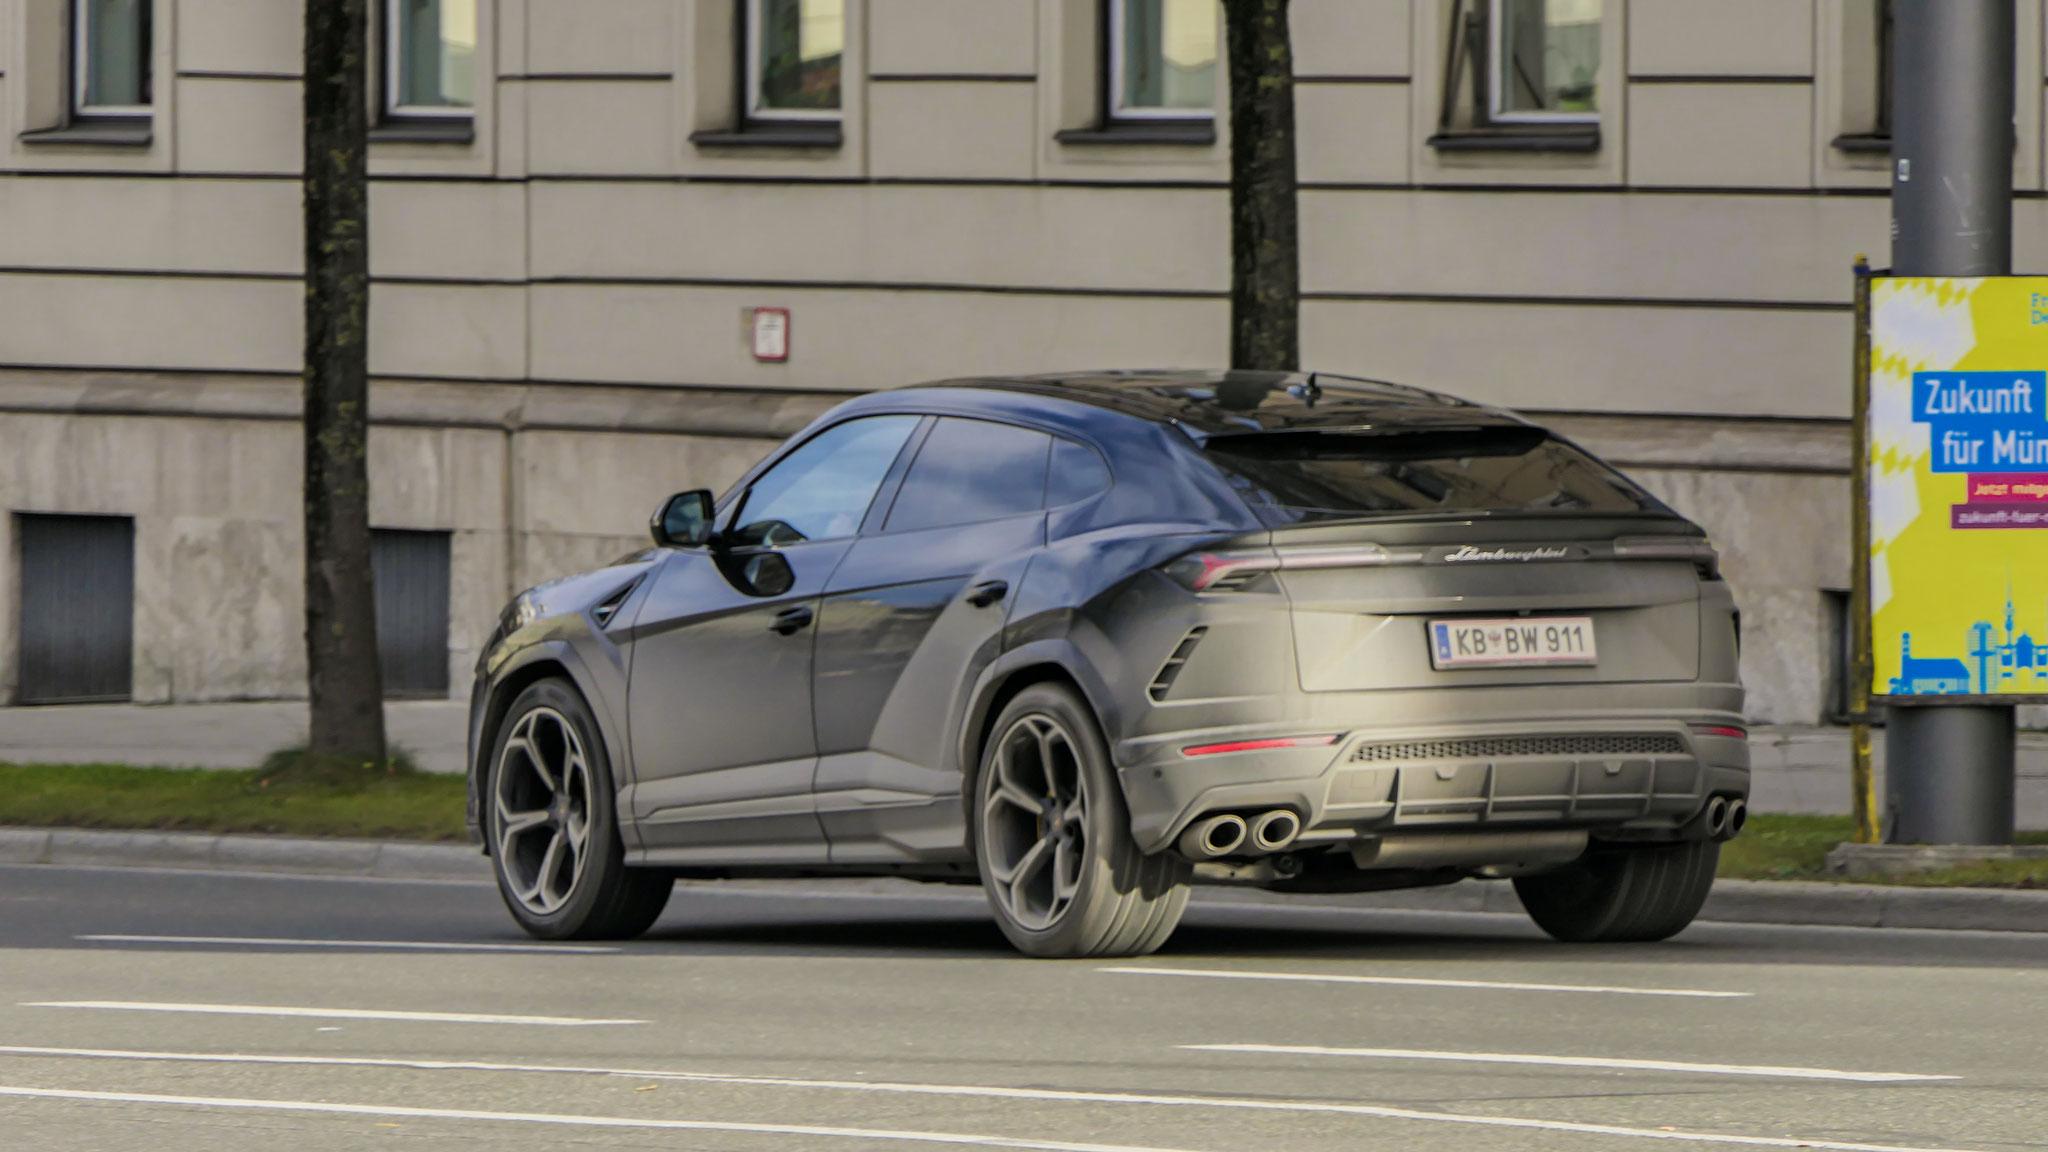 Lamborghini Urus - KB-BW-911 (AUT)